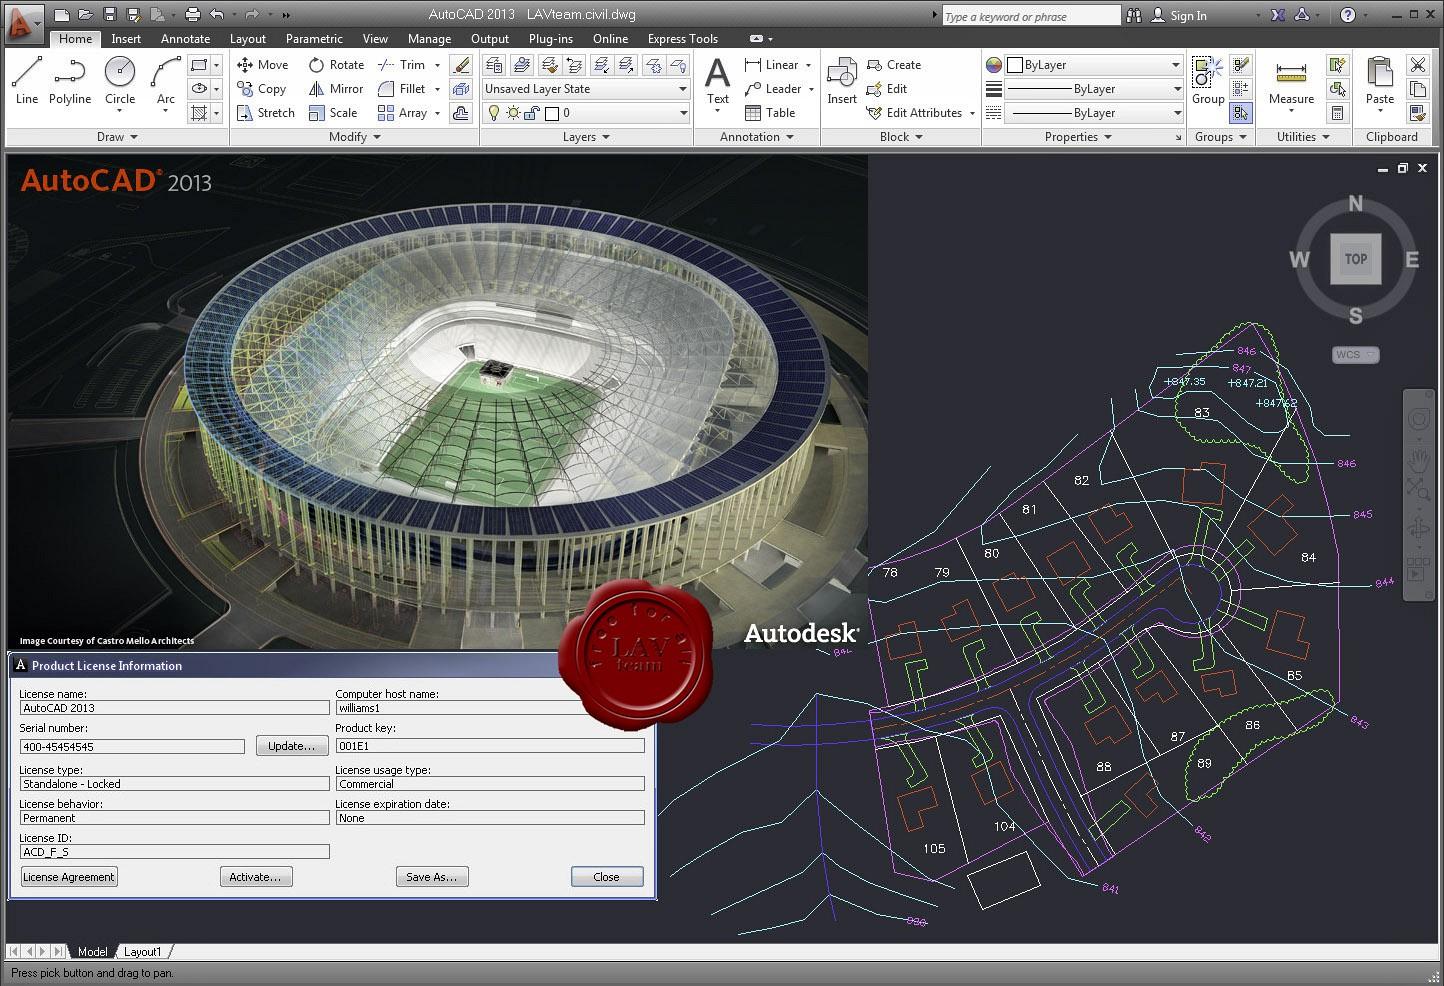 autodesk autocad 2013 crack free download